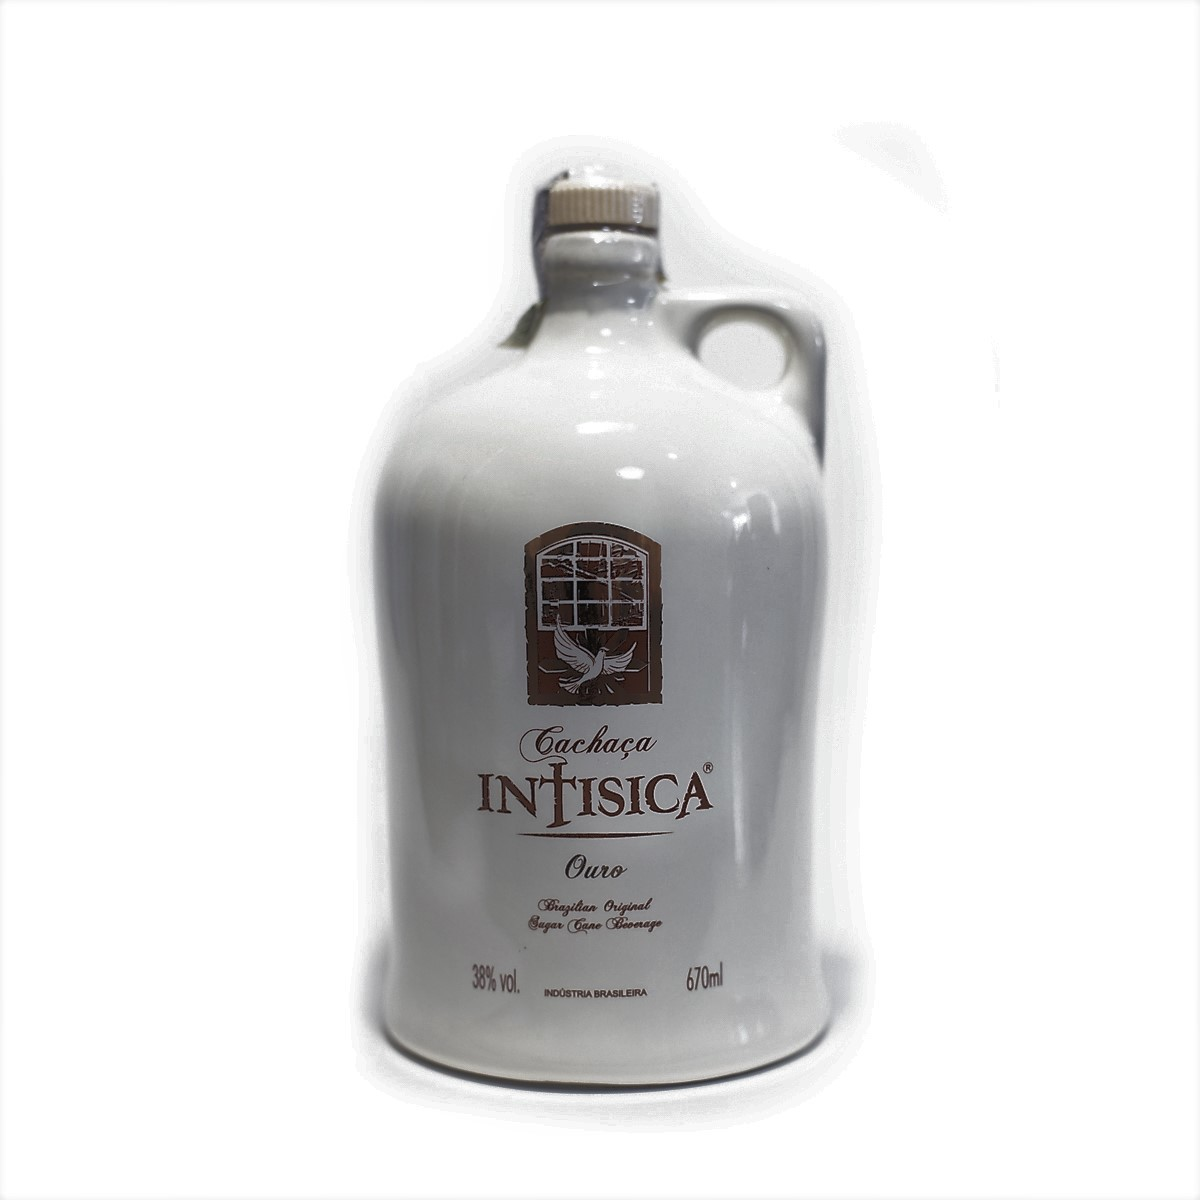 Cachaça Ouro - Intisica - Garrafa de Porcelana - 670 ml